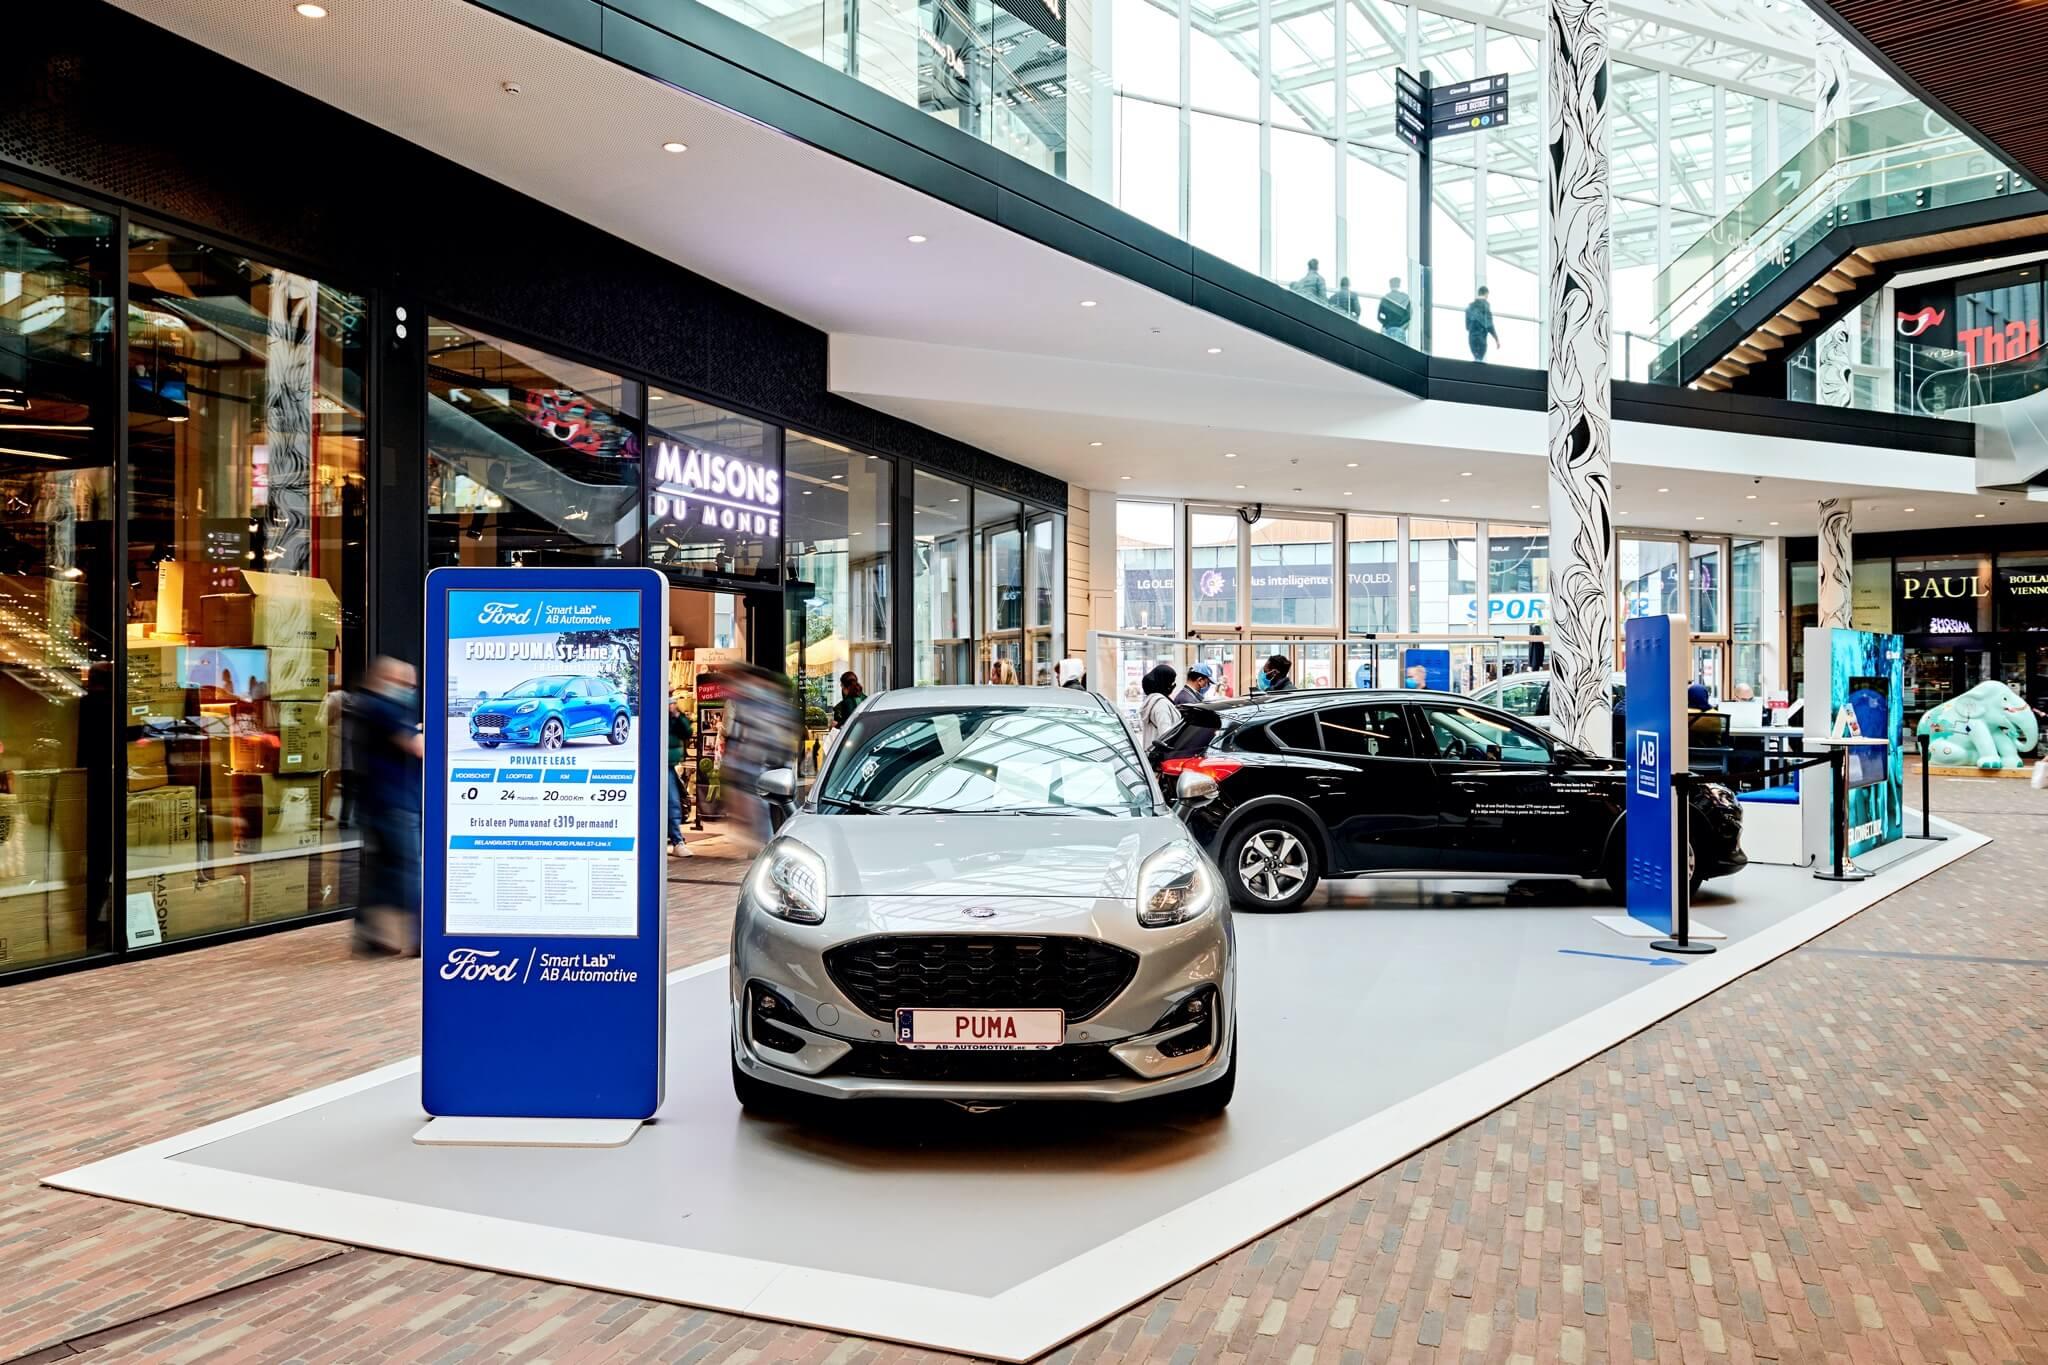 Ford | Docks Bruxsel | Shopping Center in Brussels